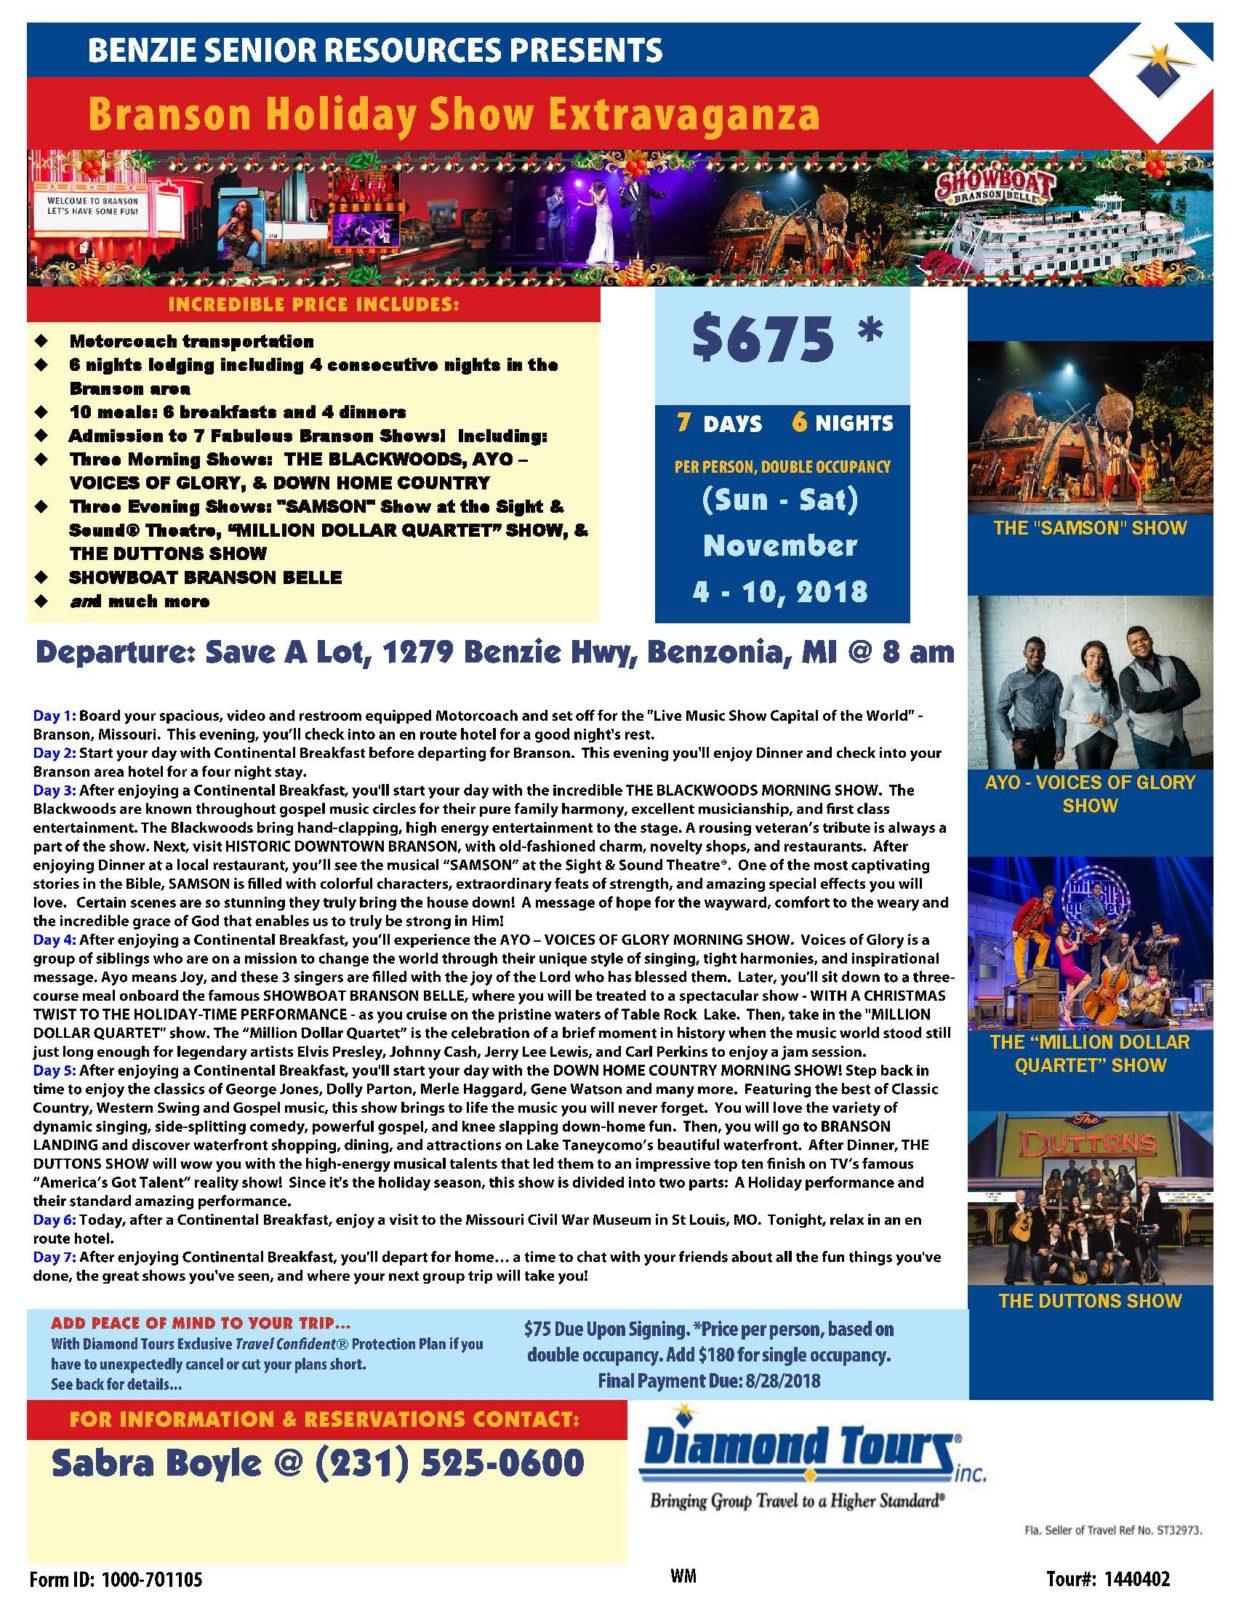 Branson Holiday Show Extravaganza – Nov 4-10, 2018 – Benzie Senior ...